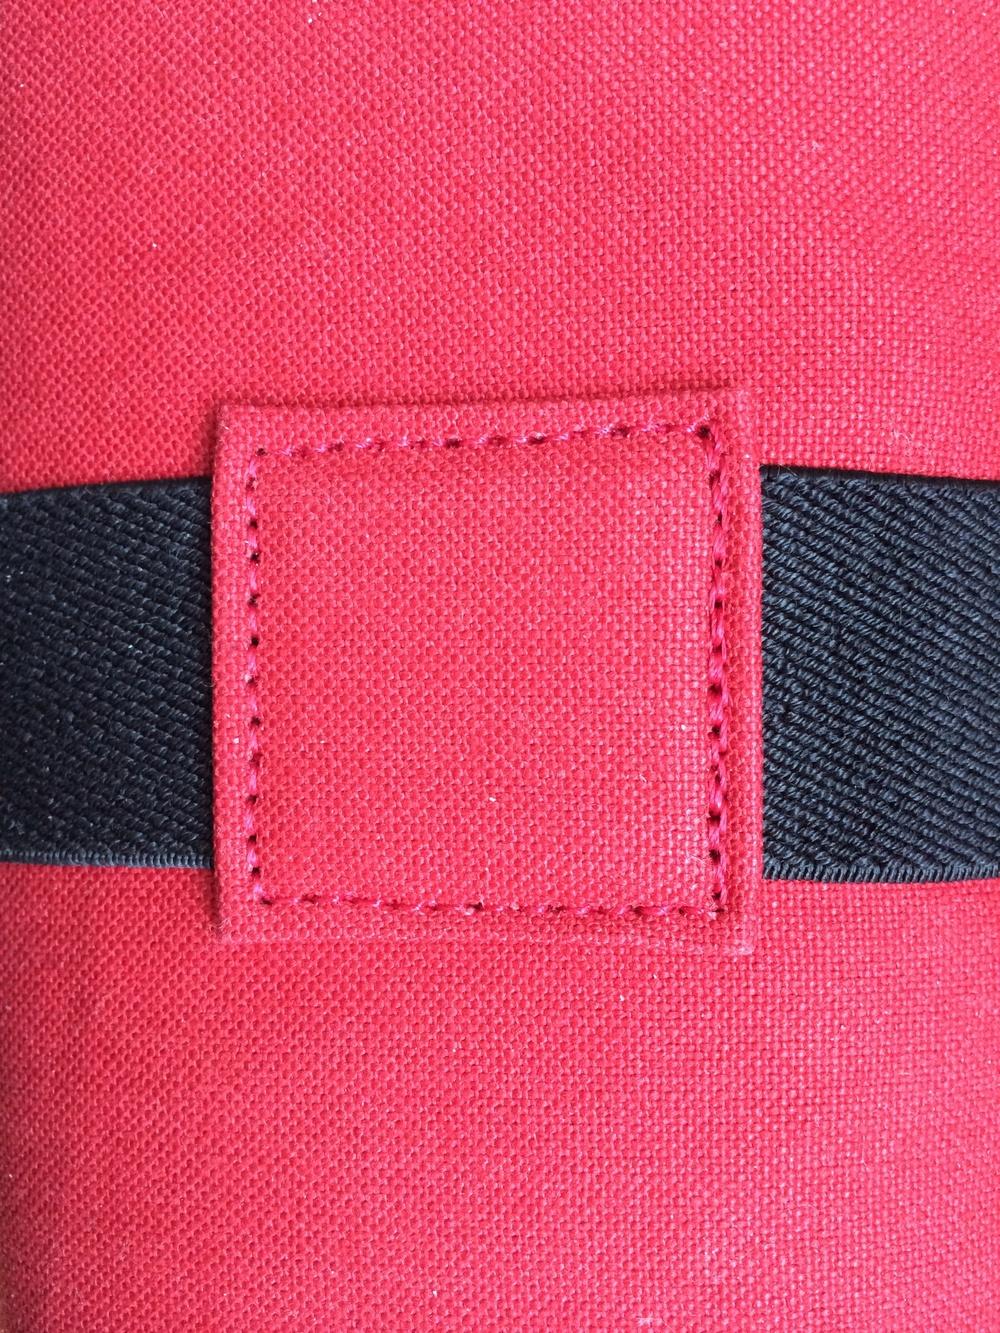 Stitching detail...